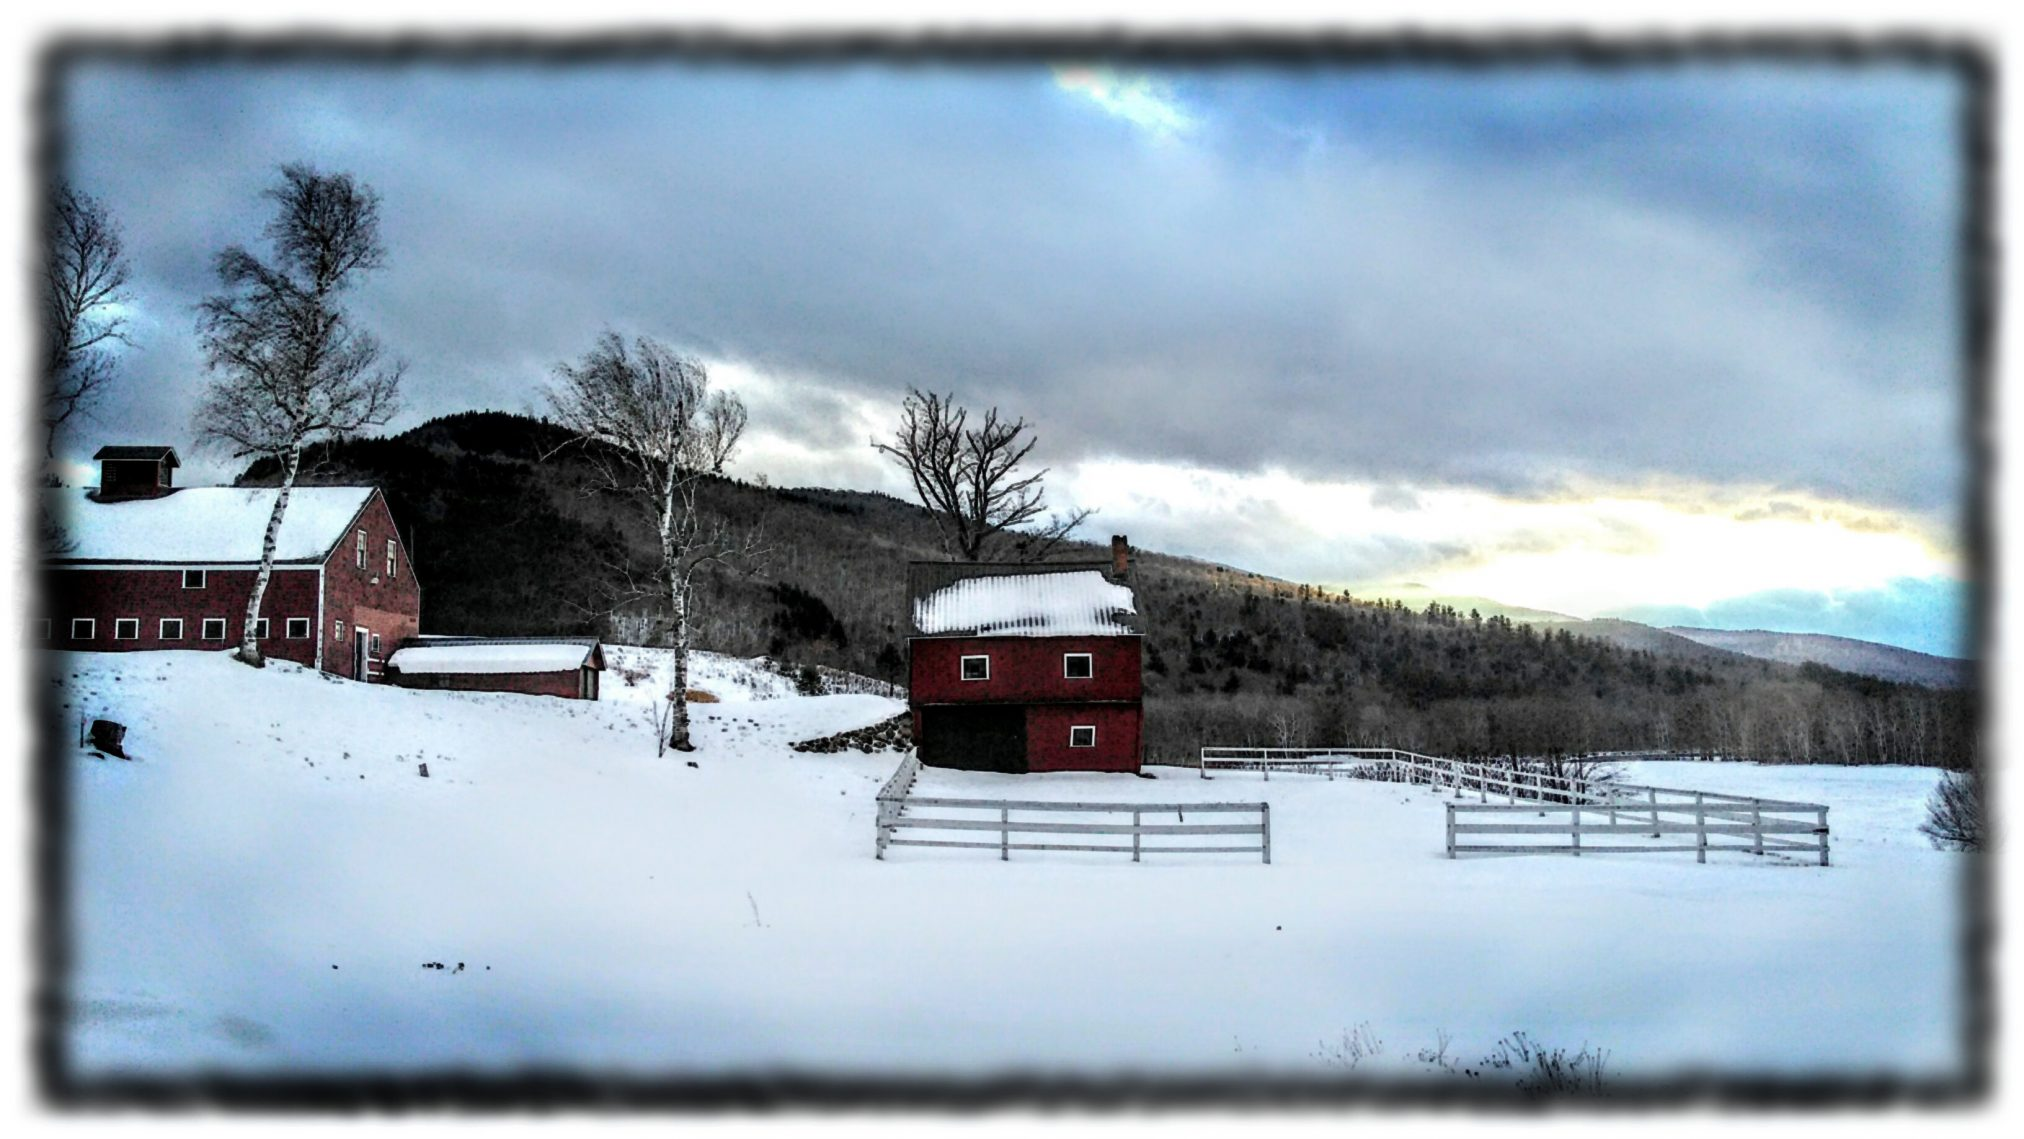 Shelburne Farmstead, New Hampshire